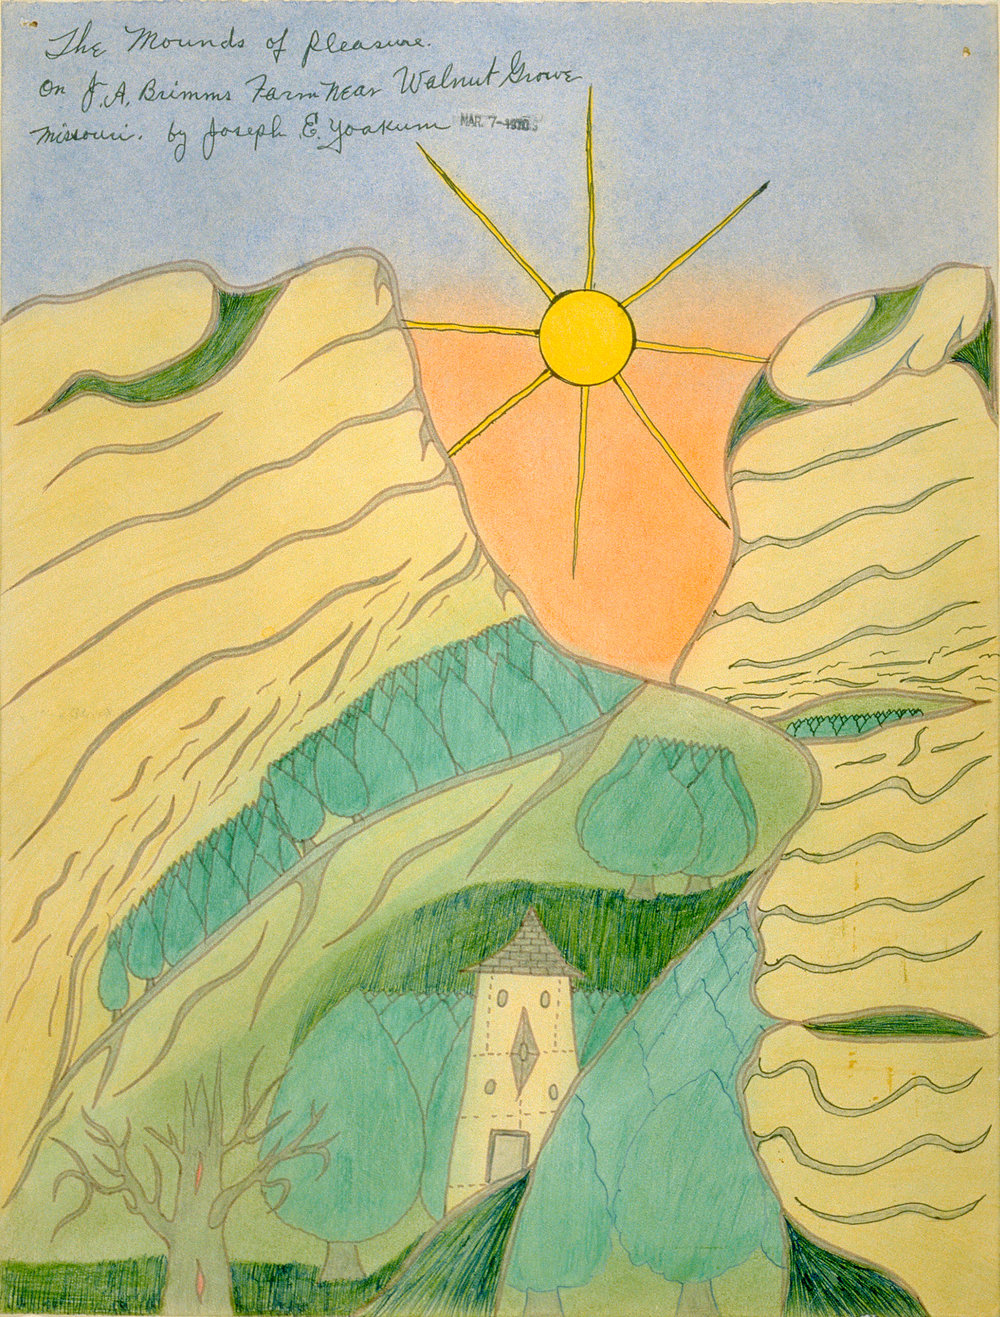 """The Mounds of Pleasure/on J.A. Brimms Farm Near Walnut Grove"" . . . 1970"